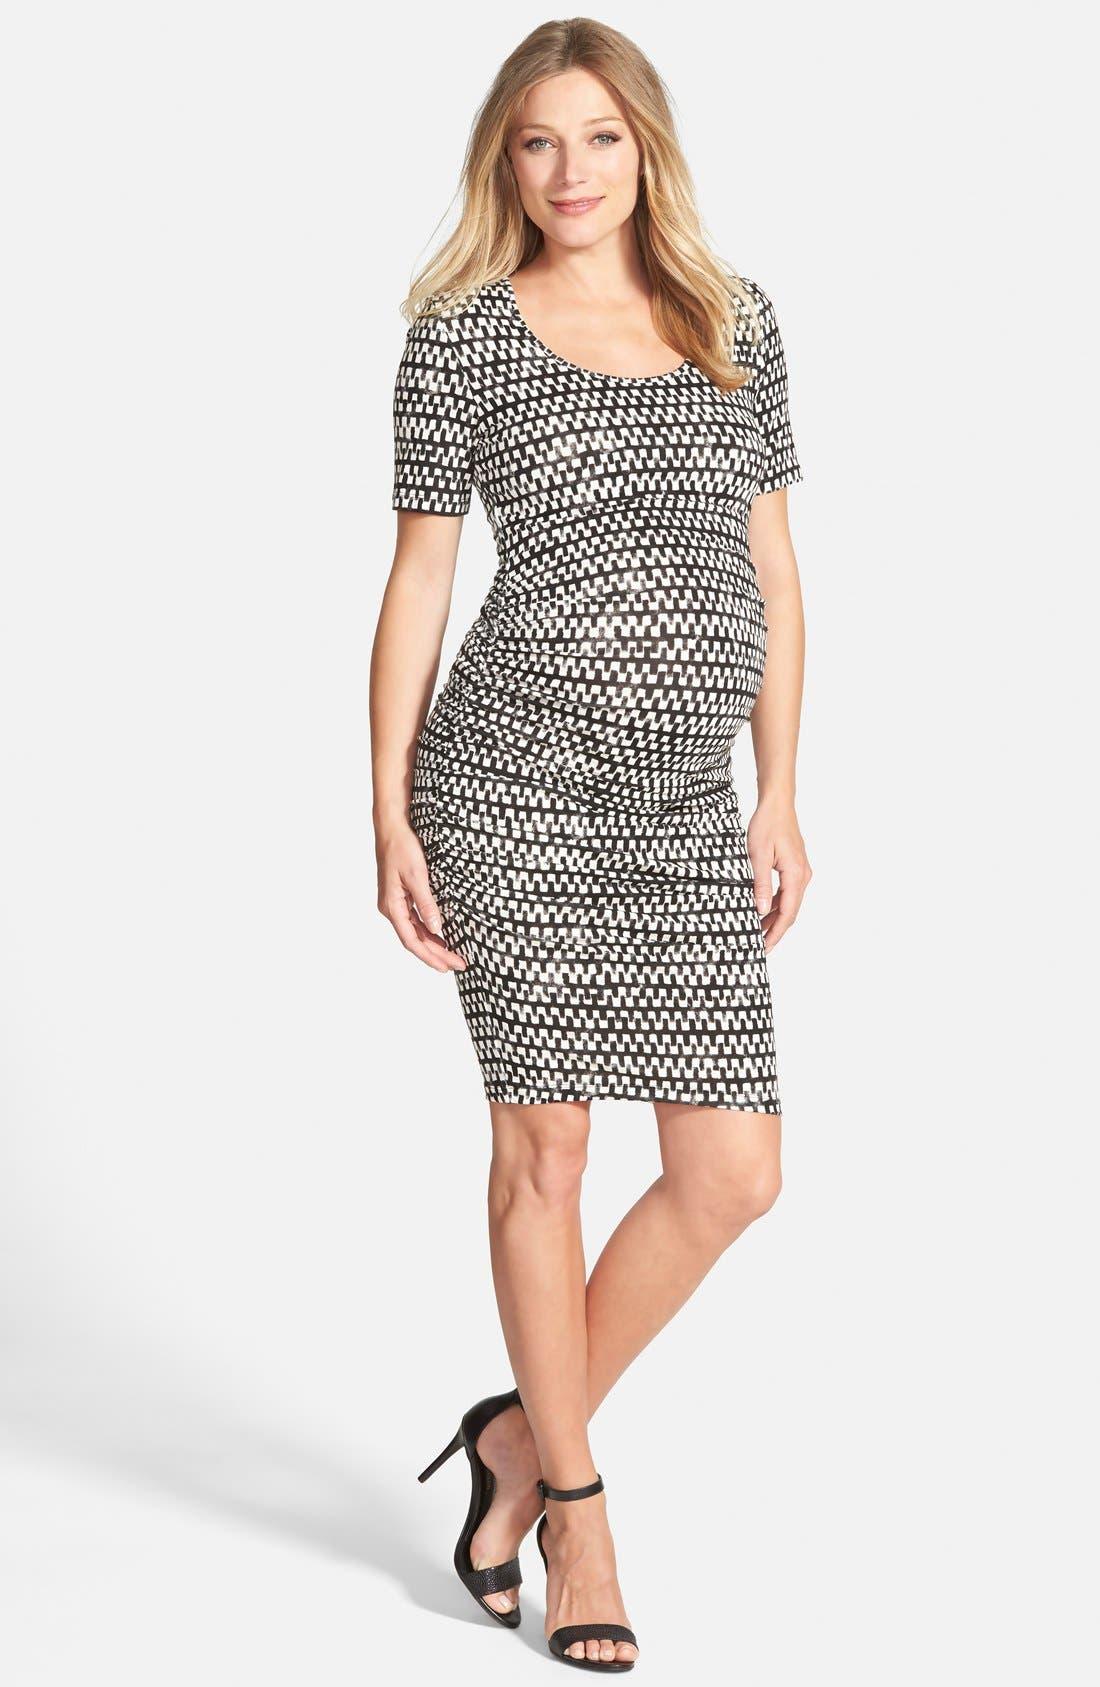 Alternate Image 1 Selected - Tart Maternity 'Bump' Midi Body-Con Maternity Dress